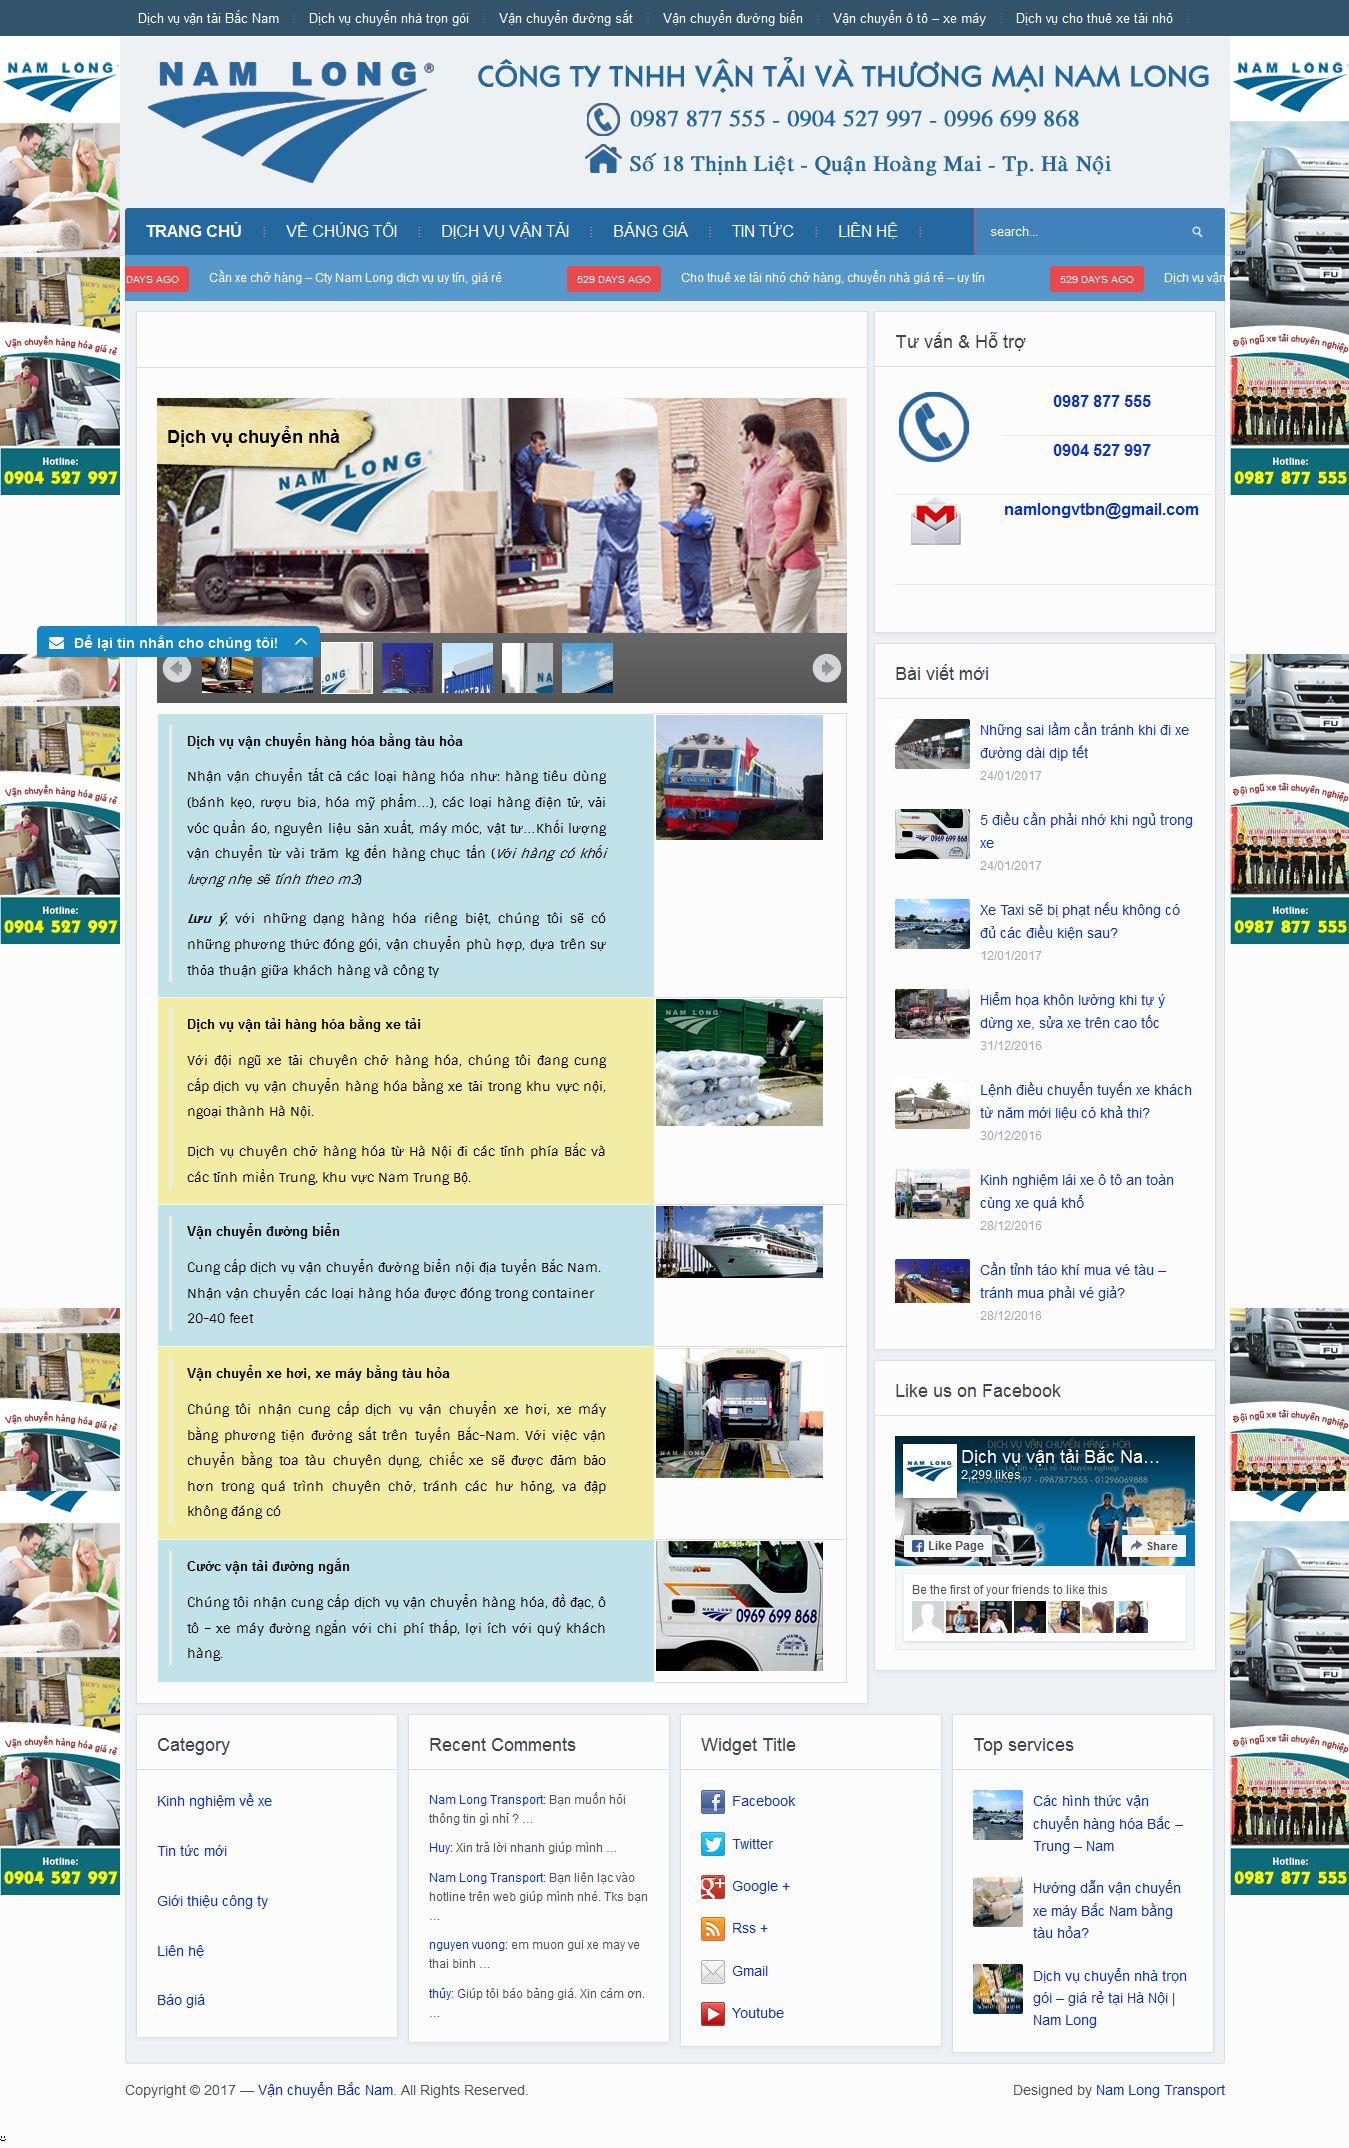 Mẫu website vận chuyển 10420